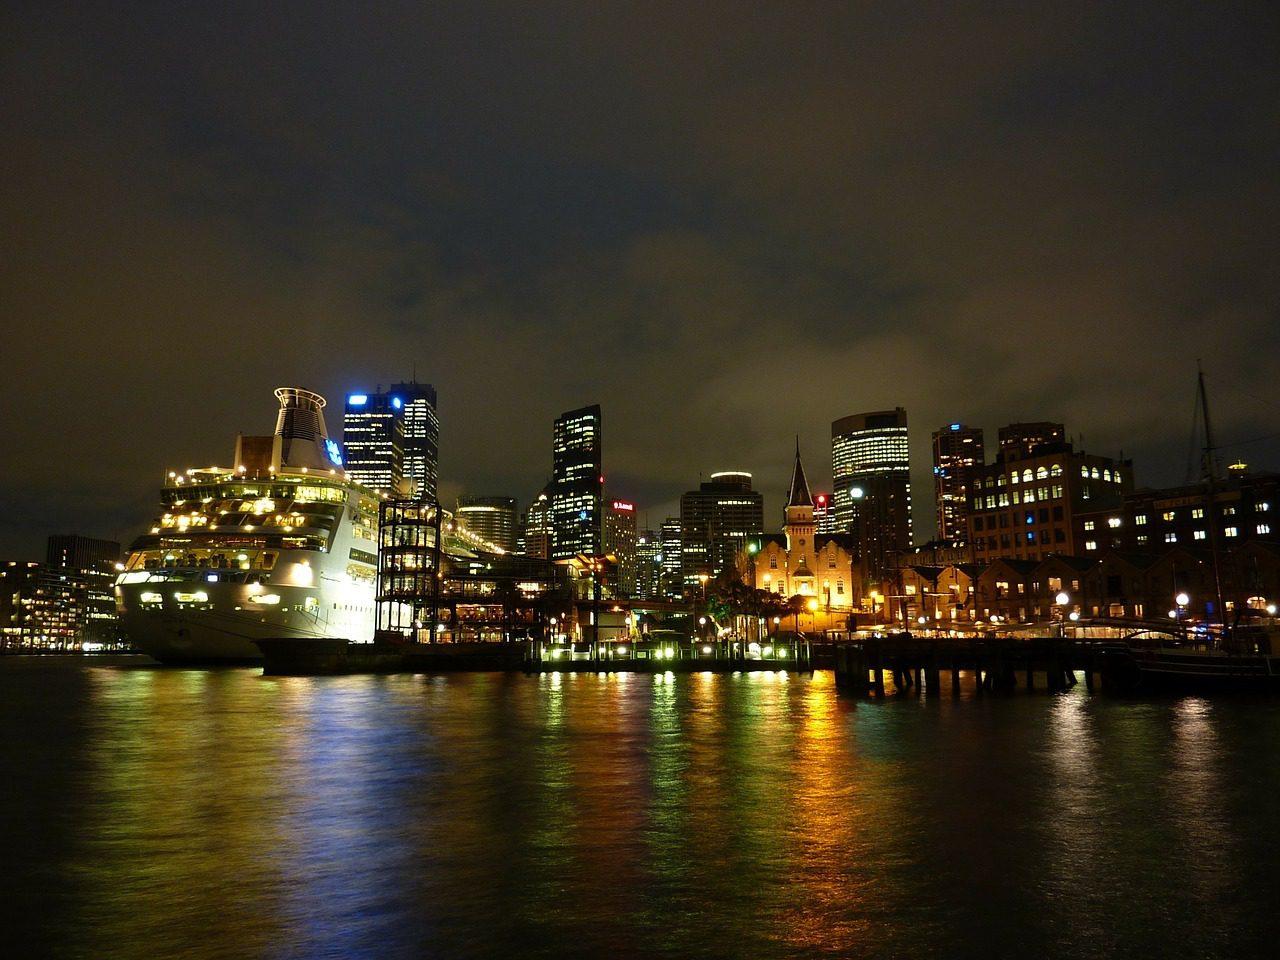 Top 5 Job-Oriented Professional Courses in Australia